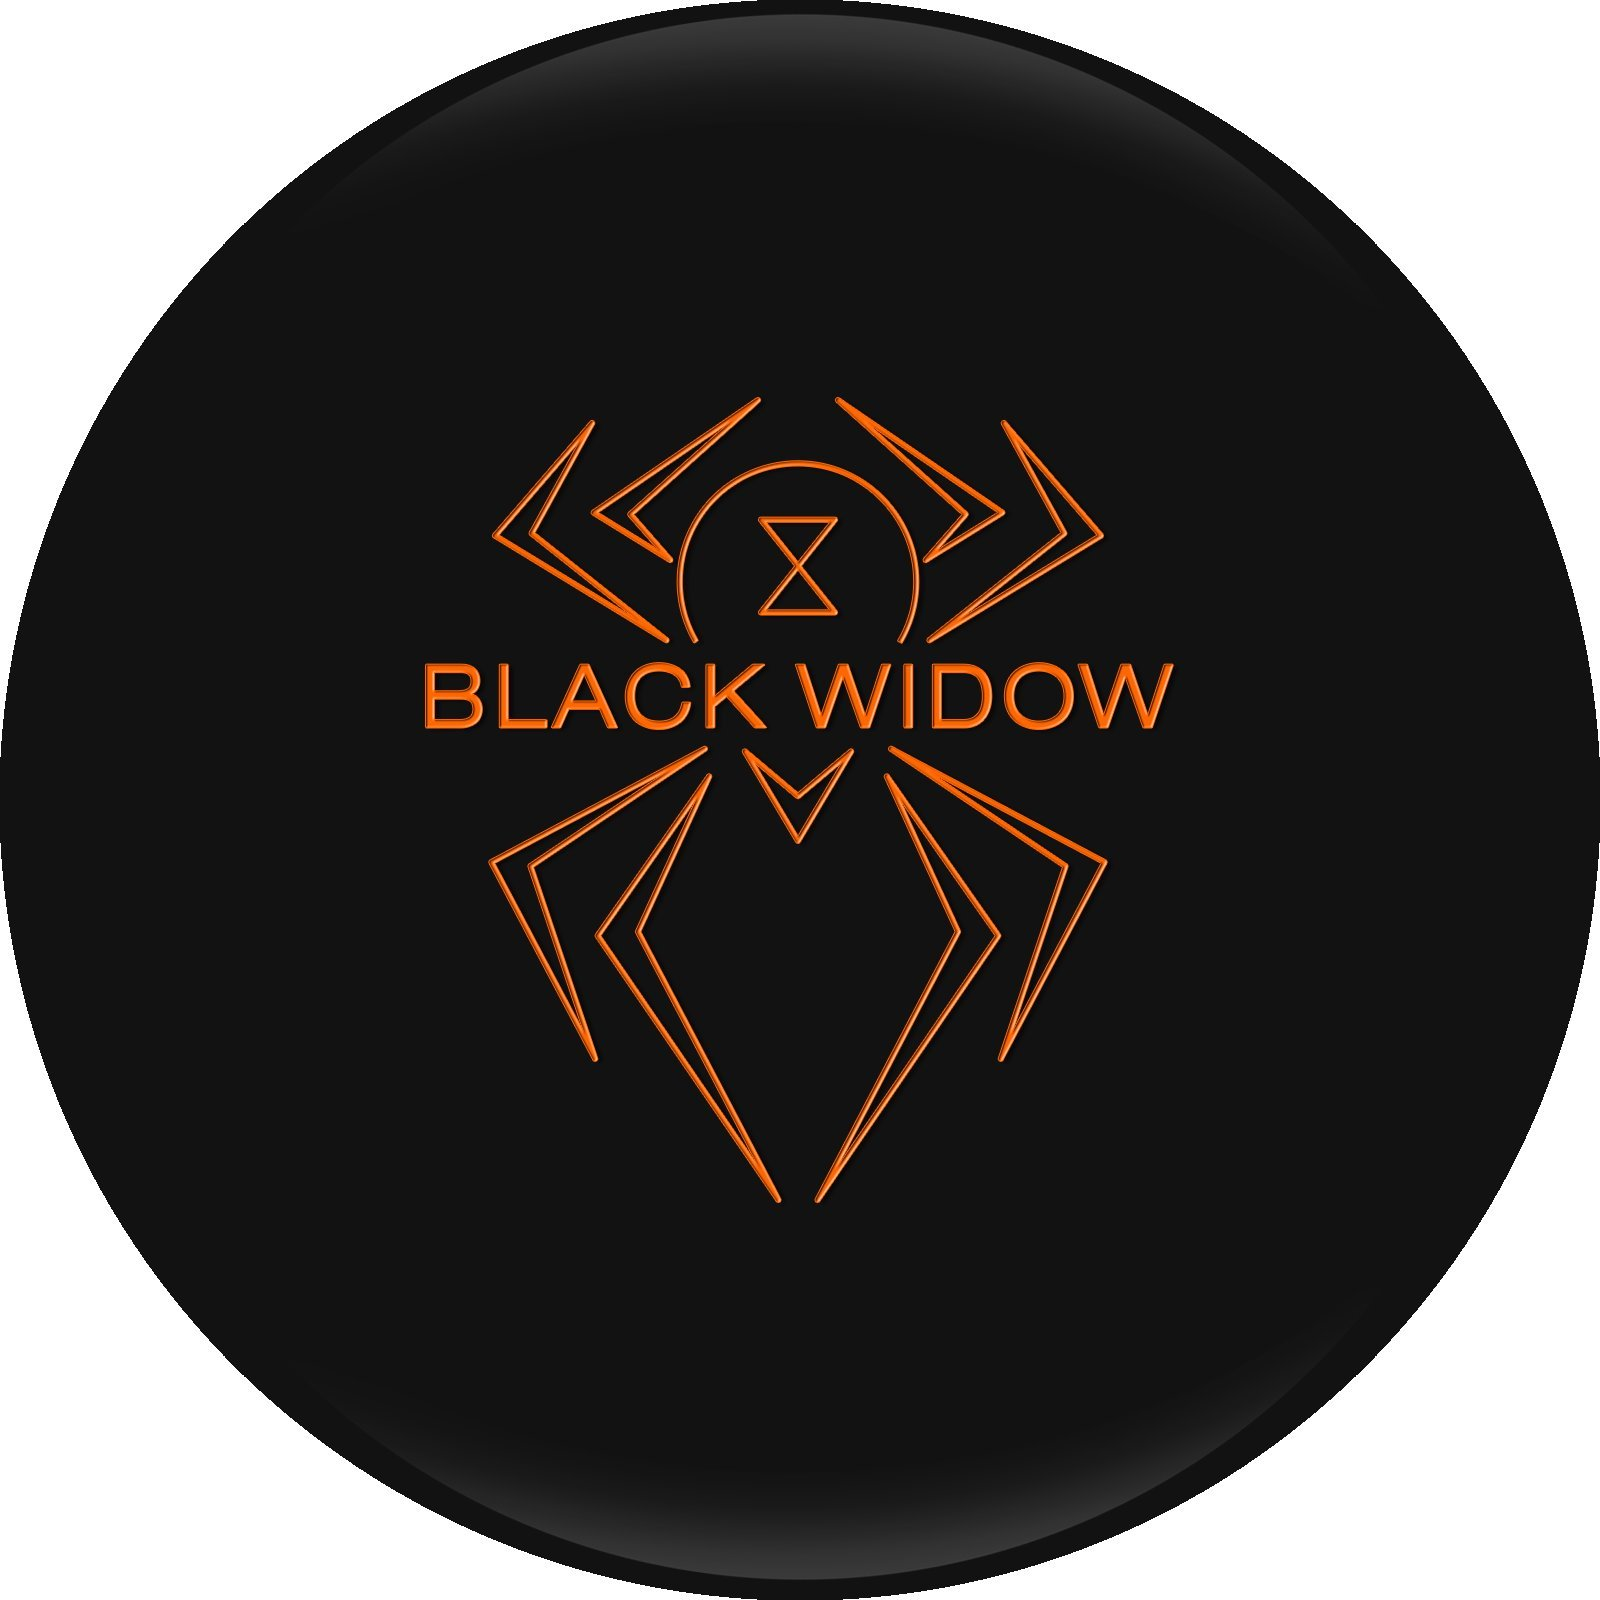 Hammer Black Widow Urethane Bowling Ball, 16lbs